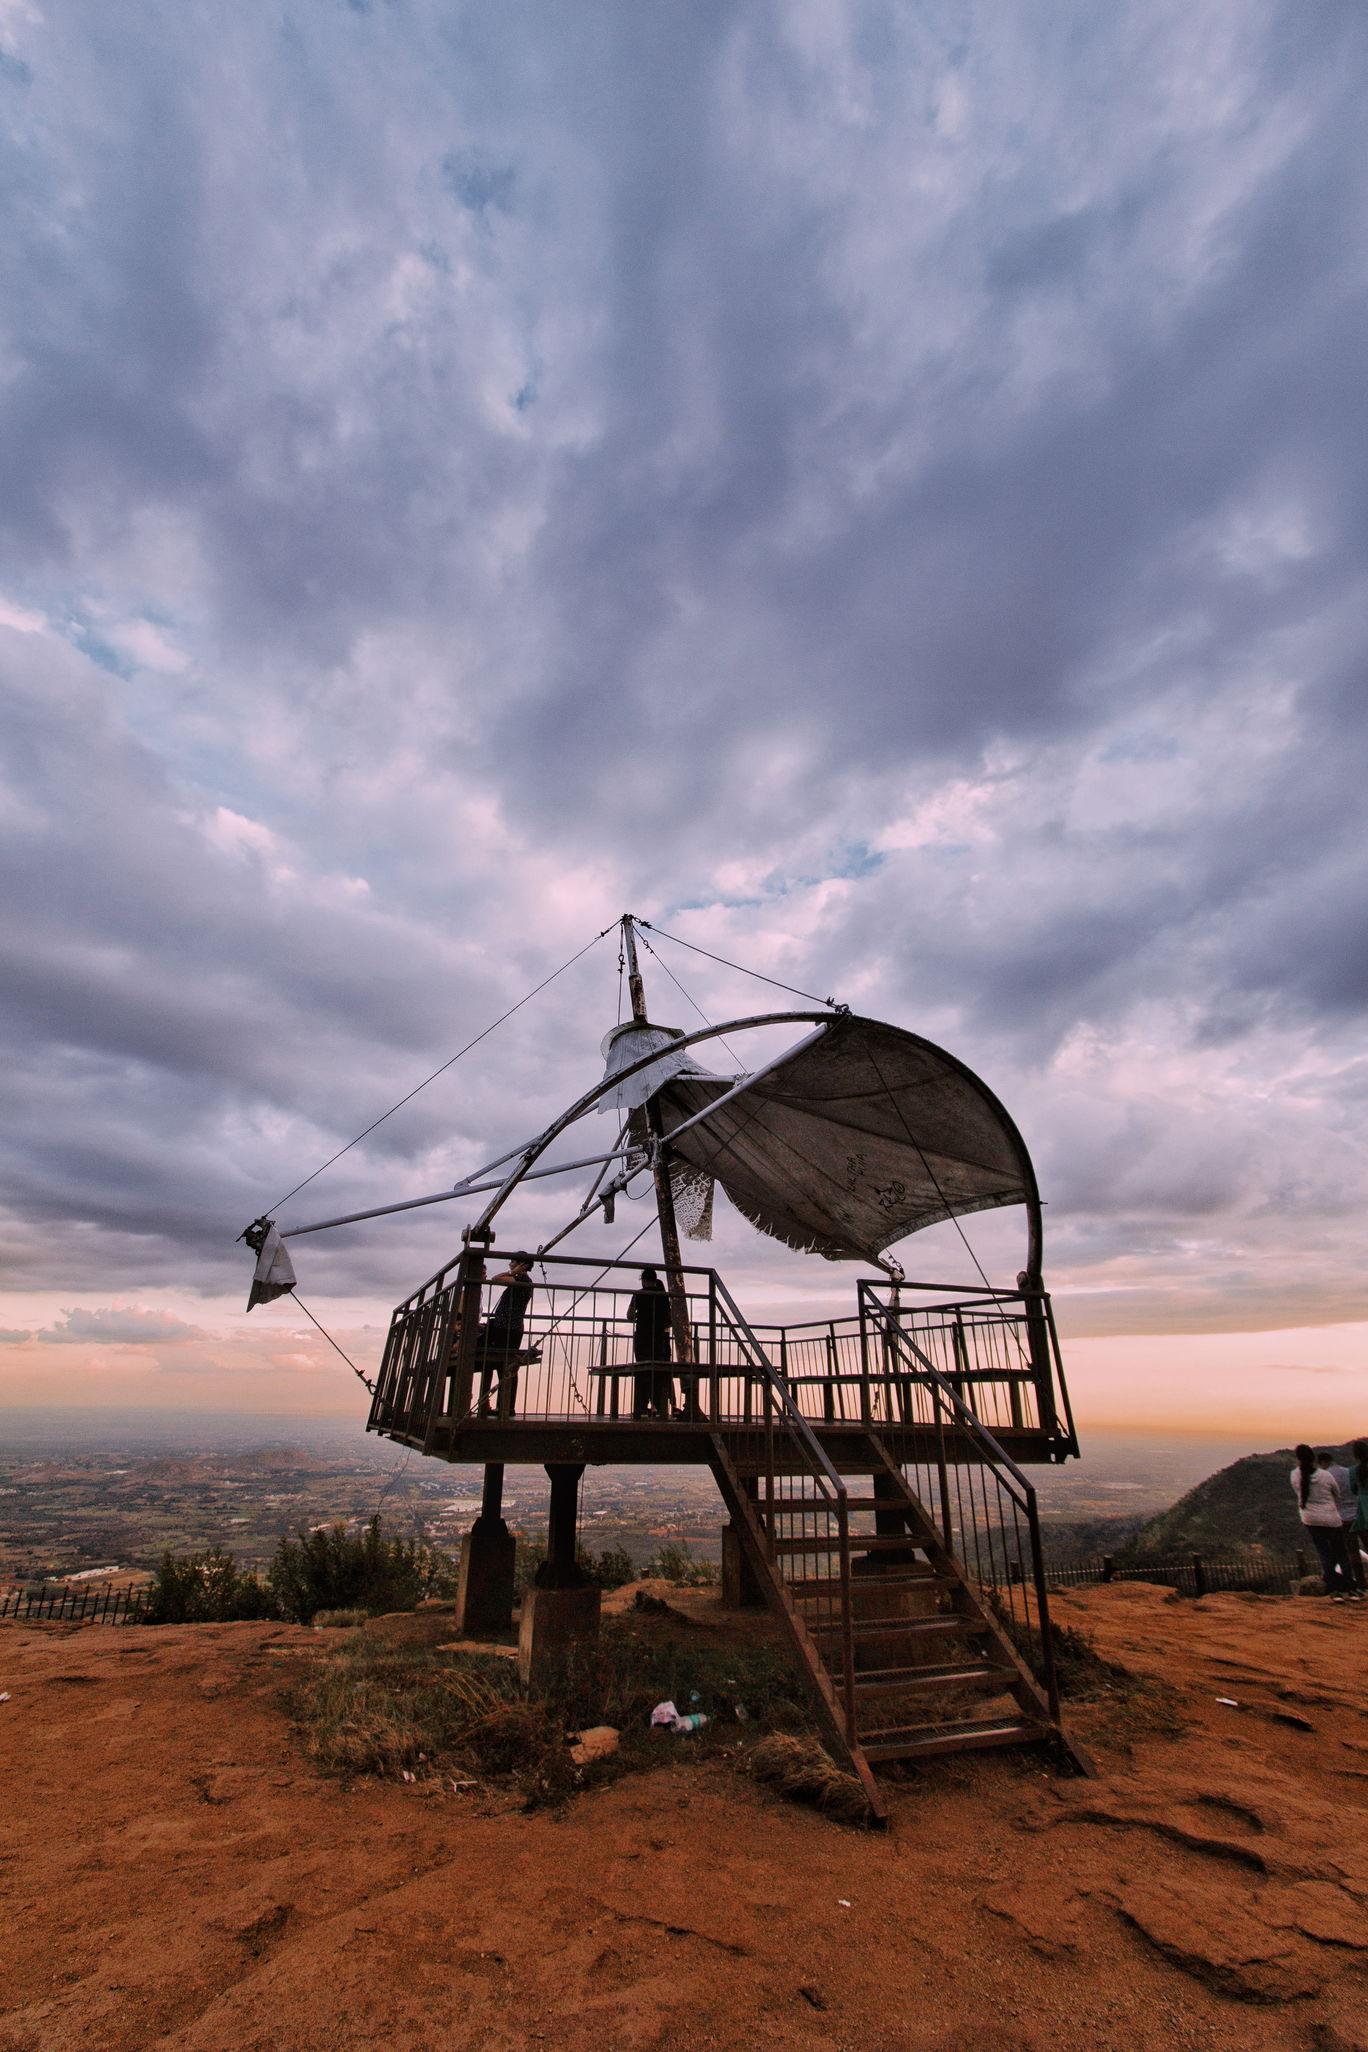 Photo of Nandi Hills By Saurav Palakkeel